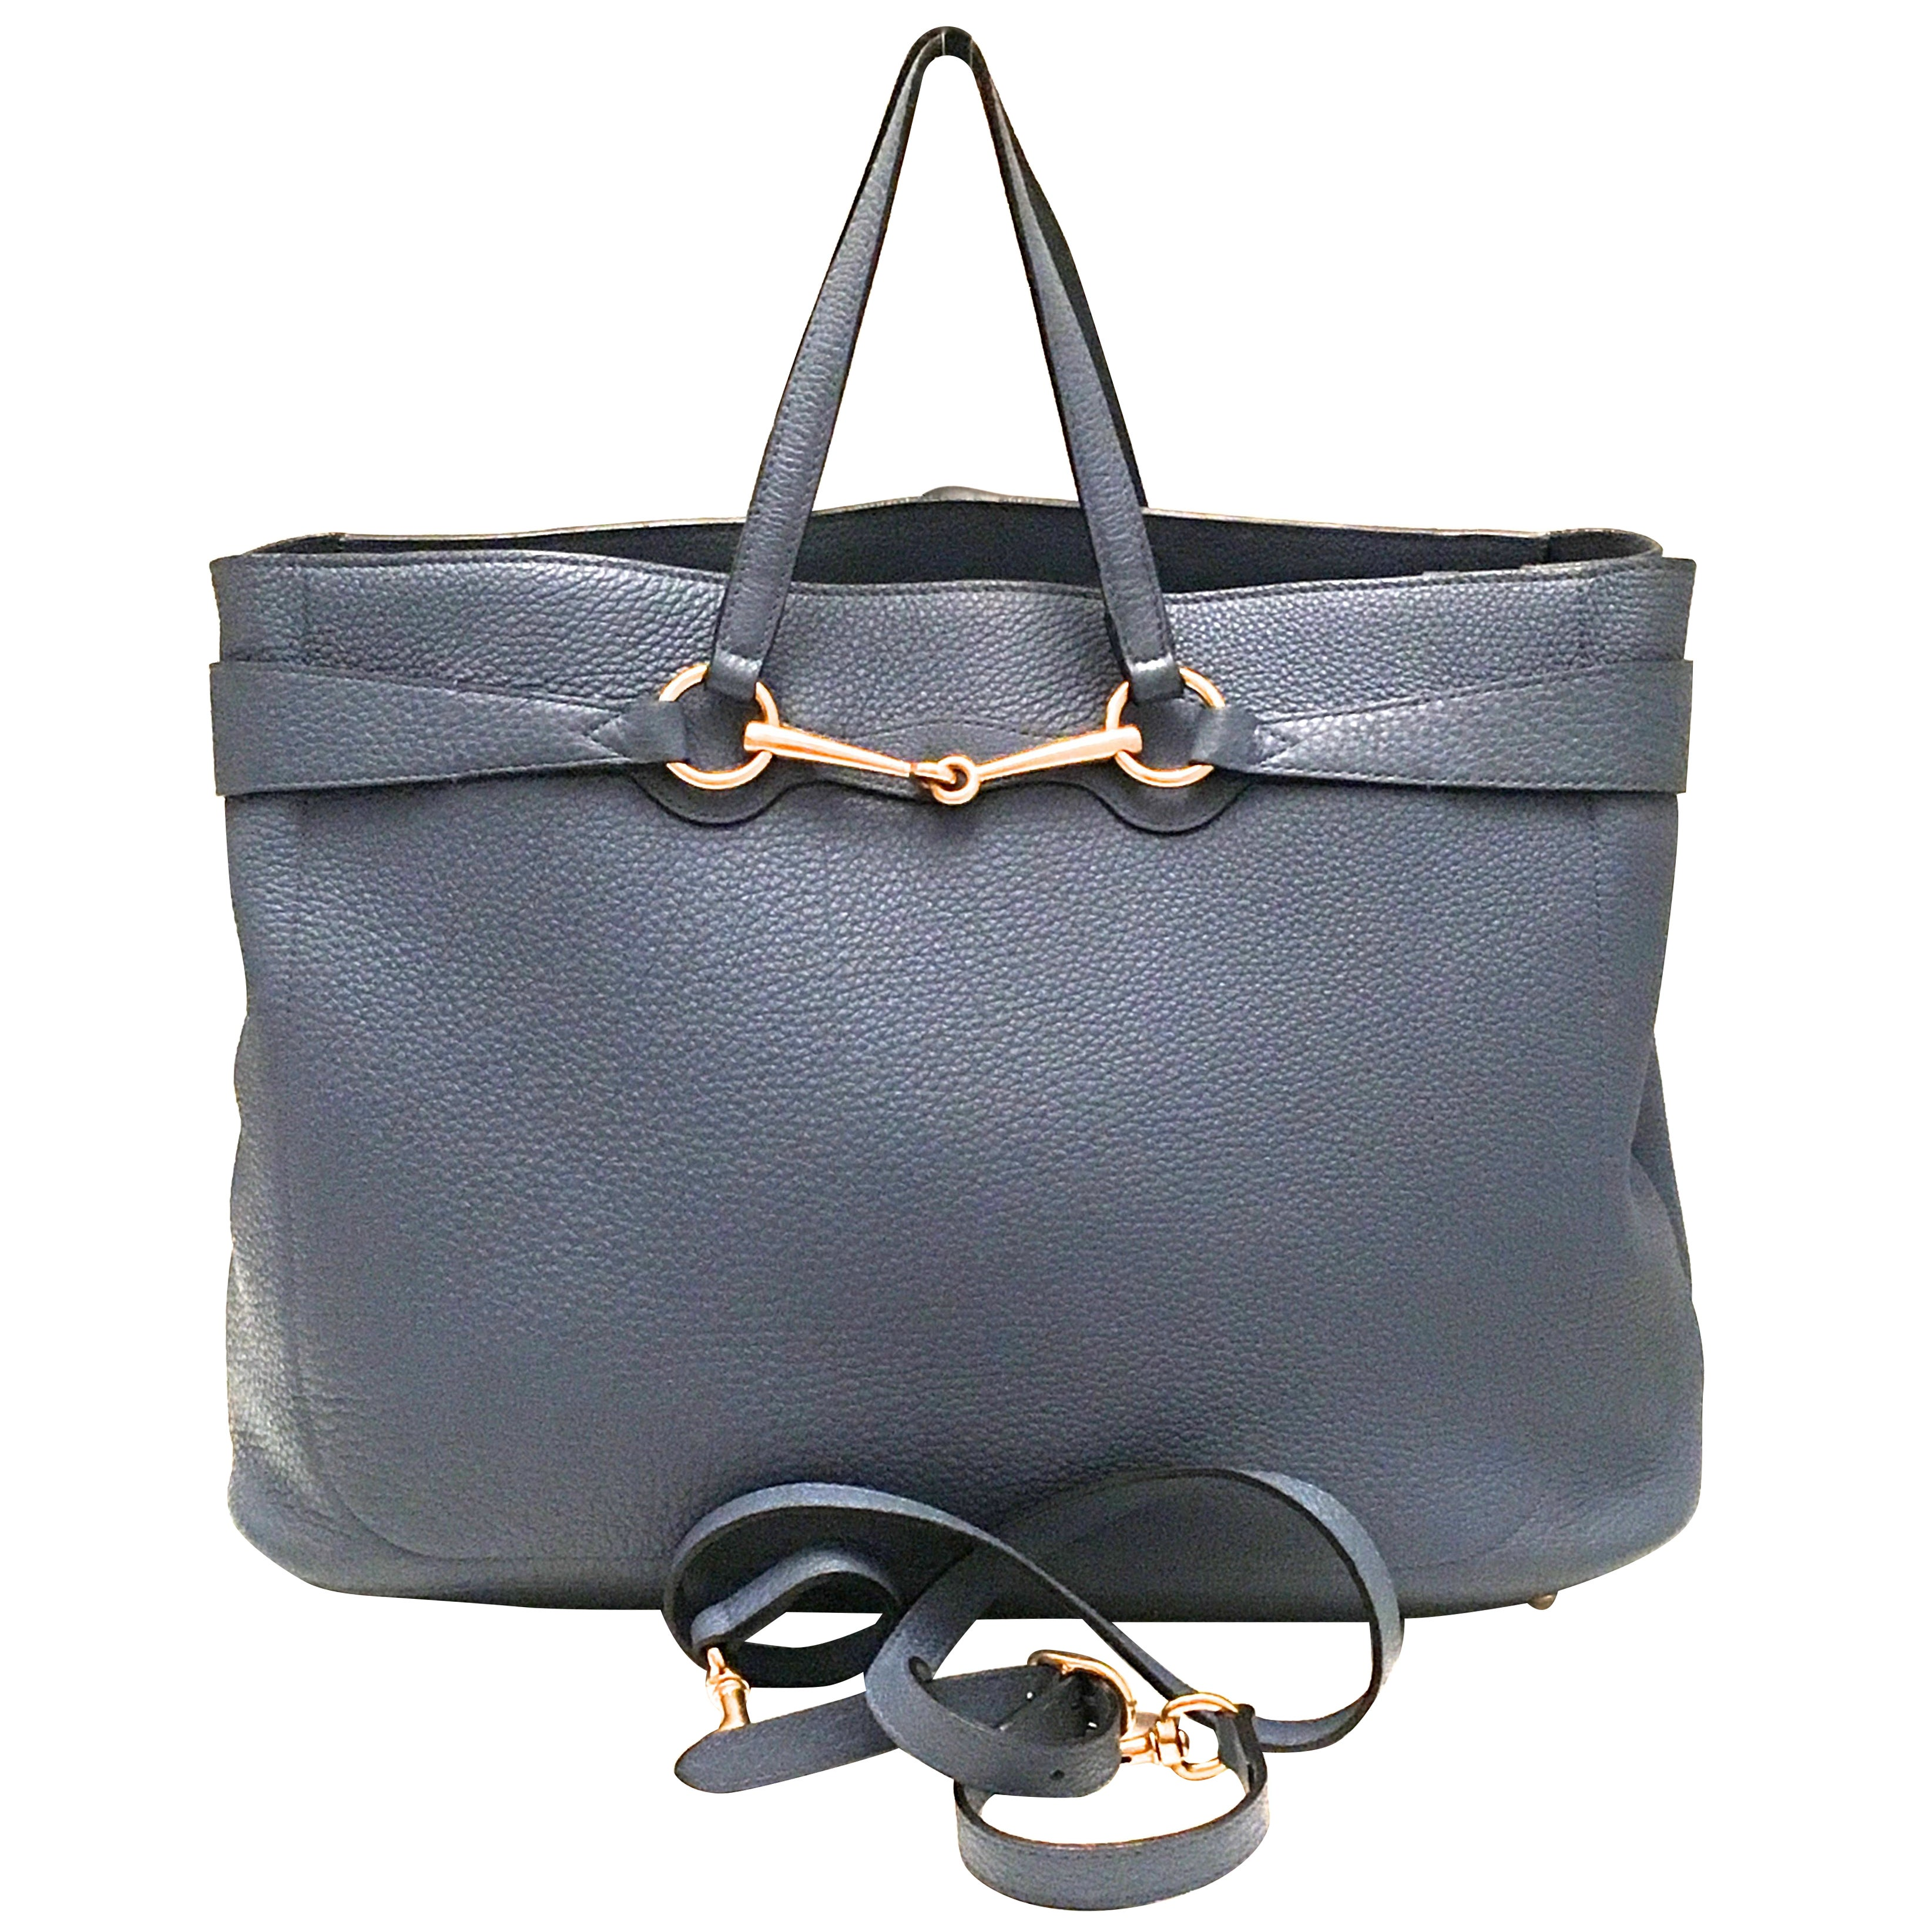 1stdibs Black Leather Handbag With Custom Love Graffiti Art, 1950s